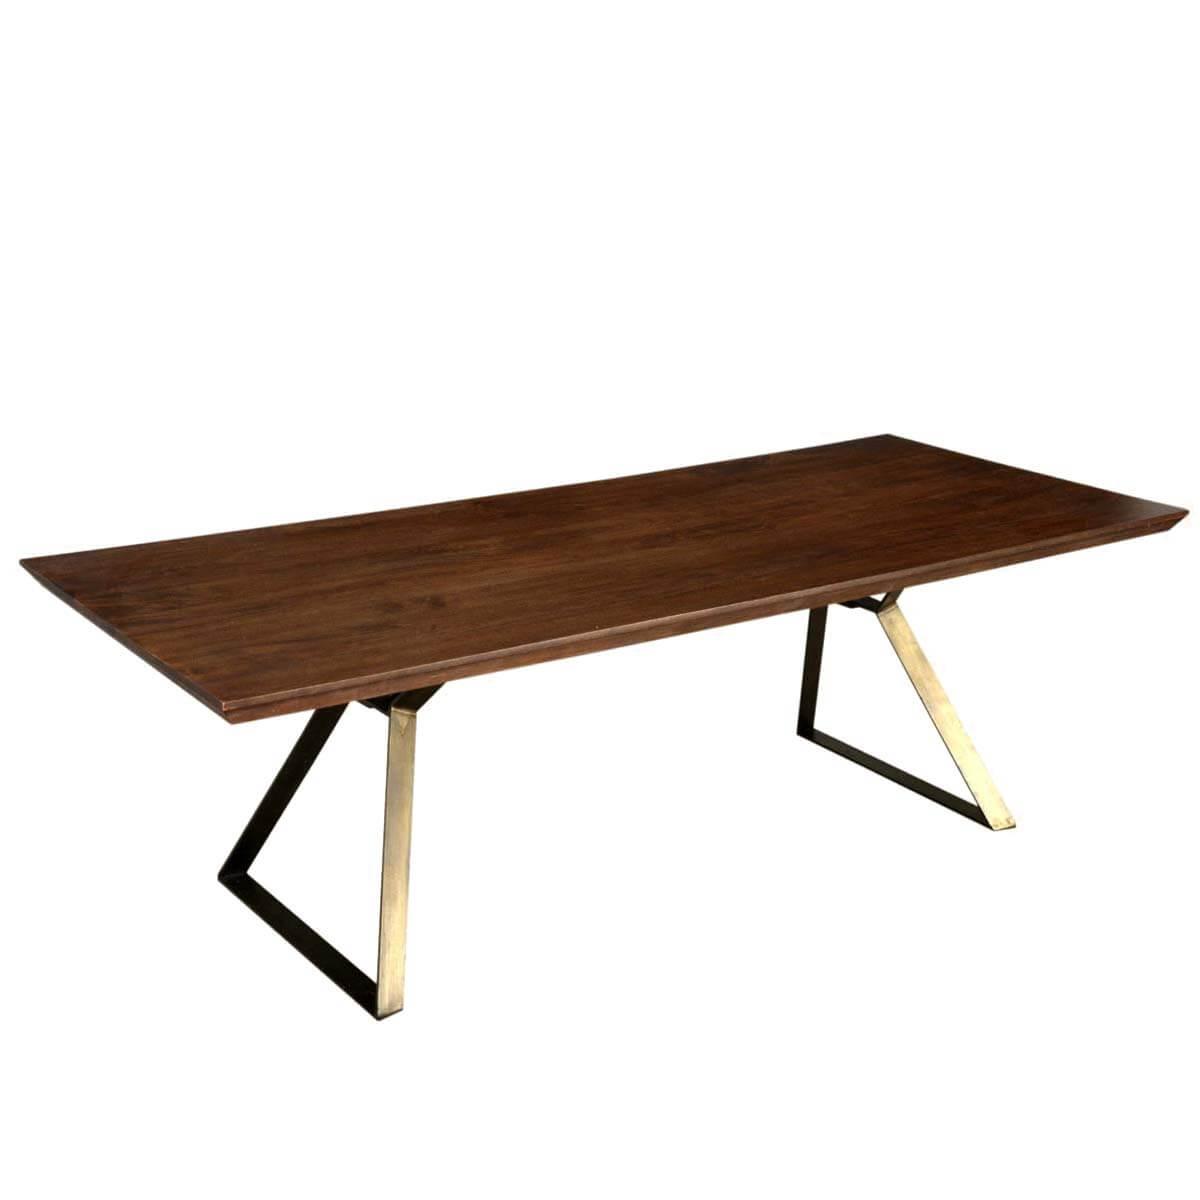 Hankin Industrial Factory Loft Style Wood Iron Dining Table